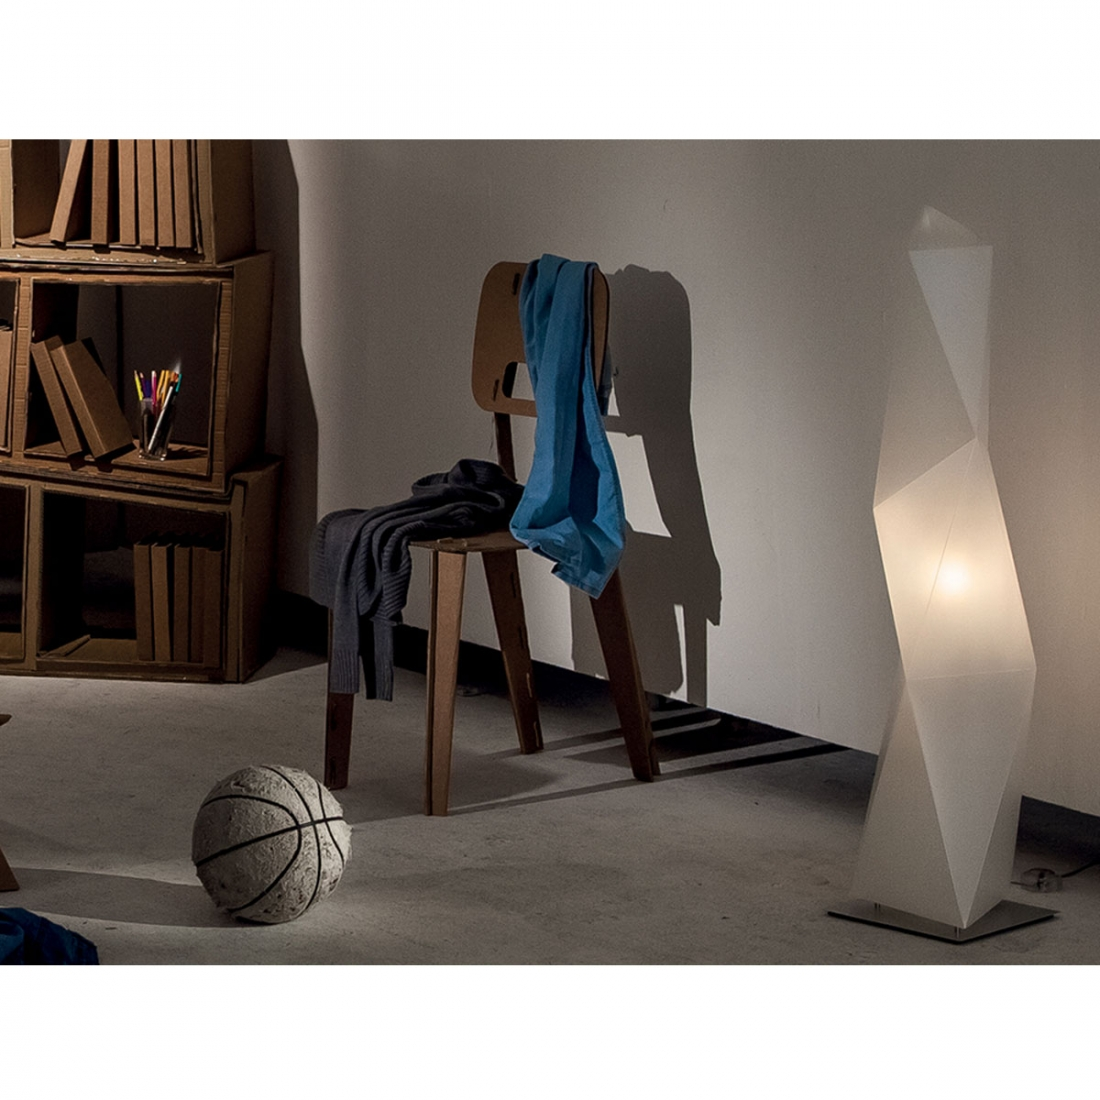 lampadaire-de-salon-design-diamond-slamp.jpg.pagespeed.ce.wPDJGxHb_m